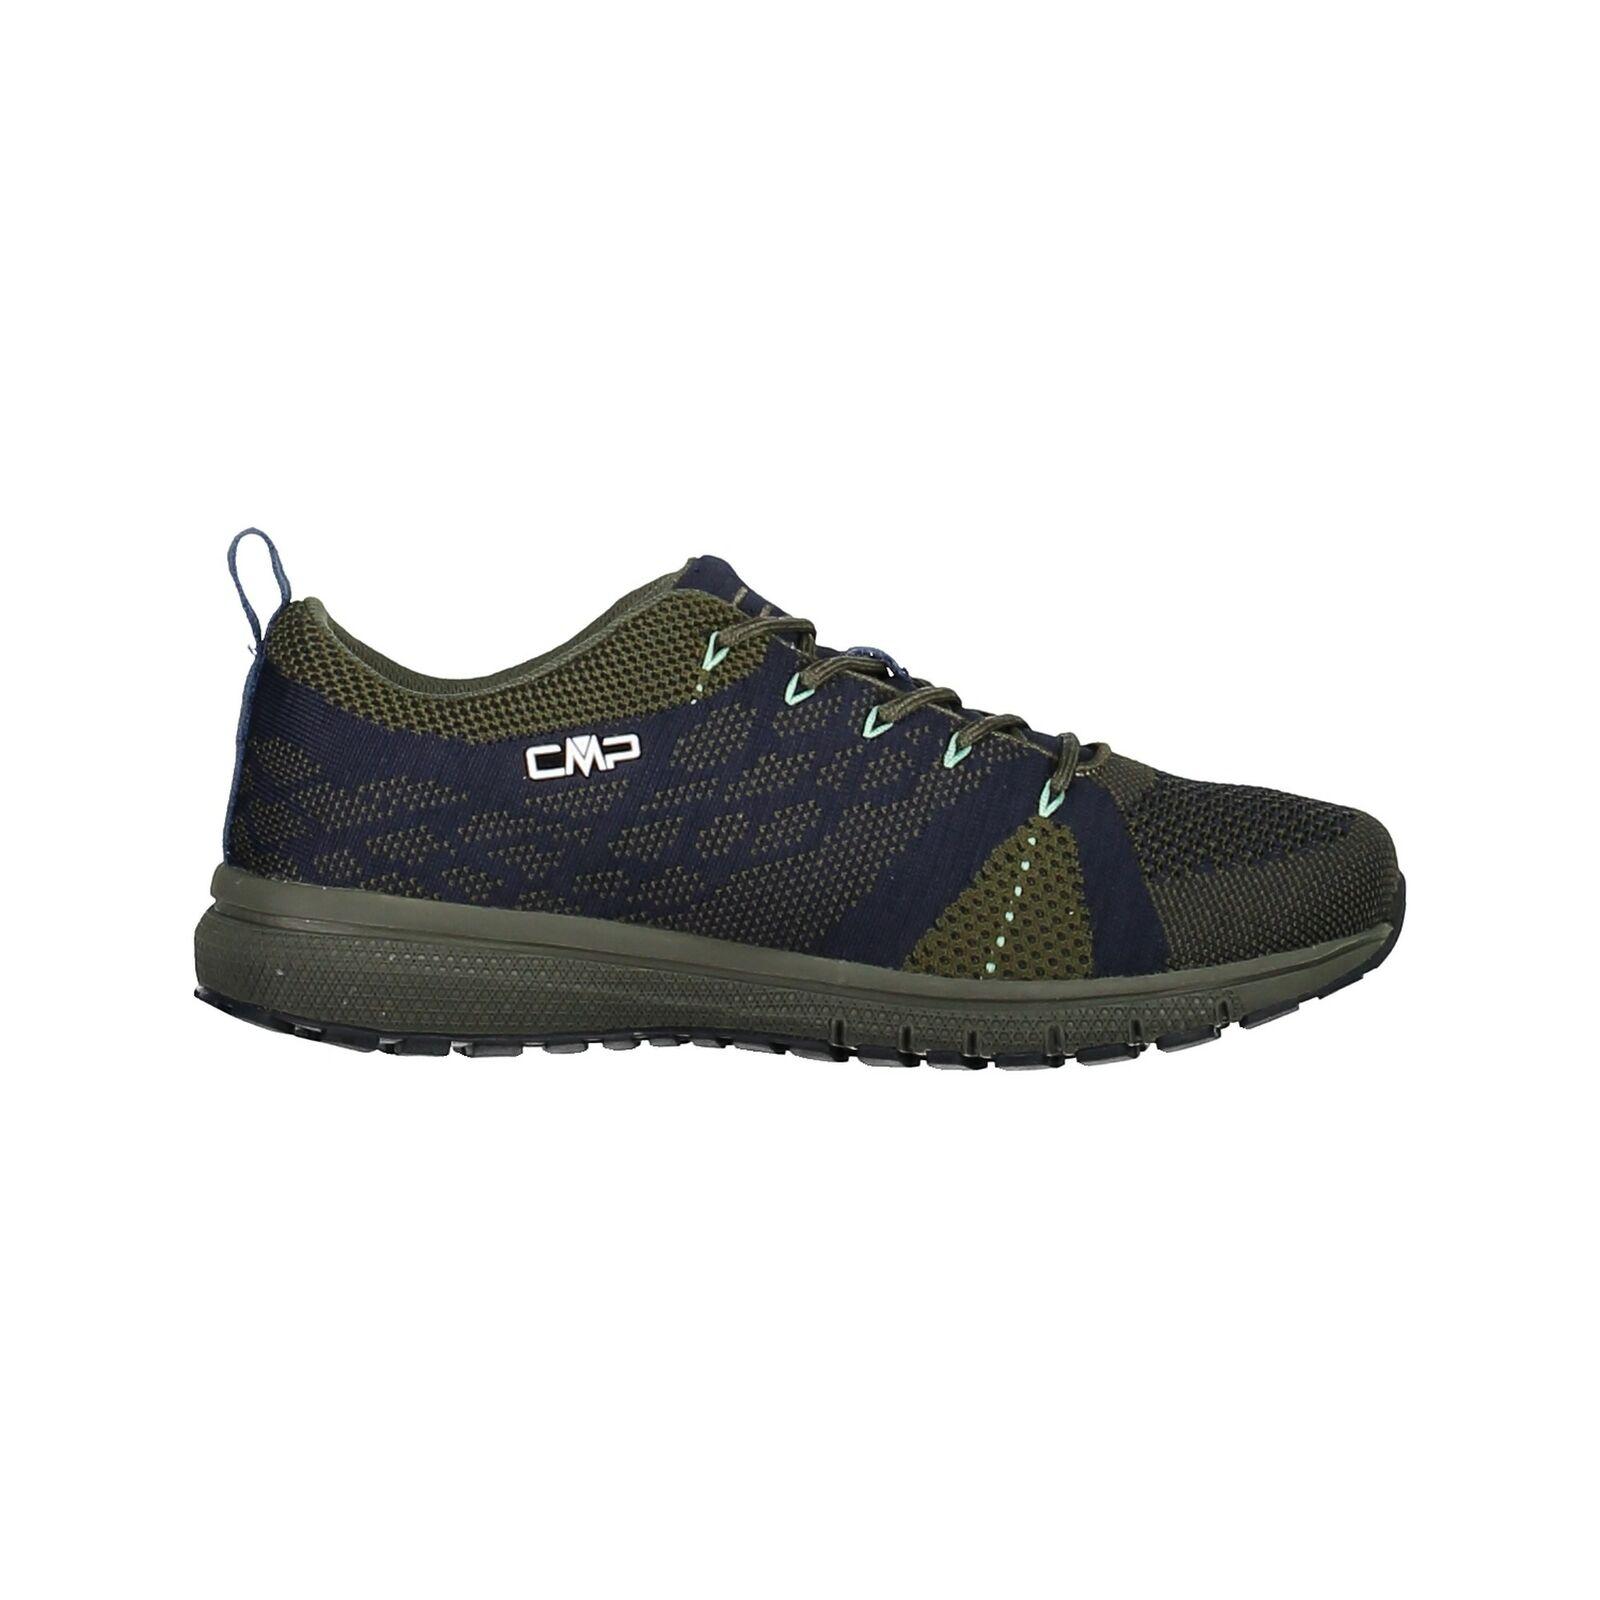 CMP Zapatillas de Deporte Gimanasia Chamaeleontis Foam Gimnasio Azul Oscuro